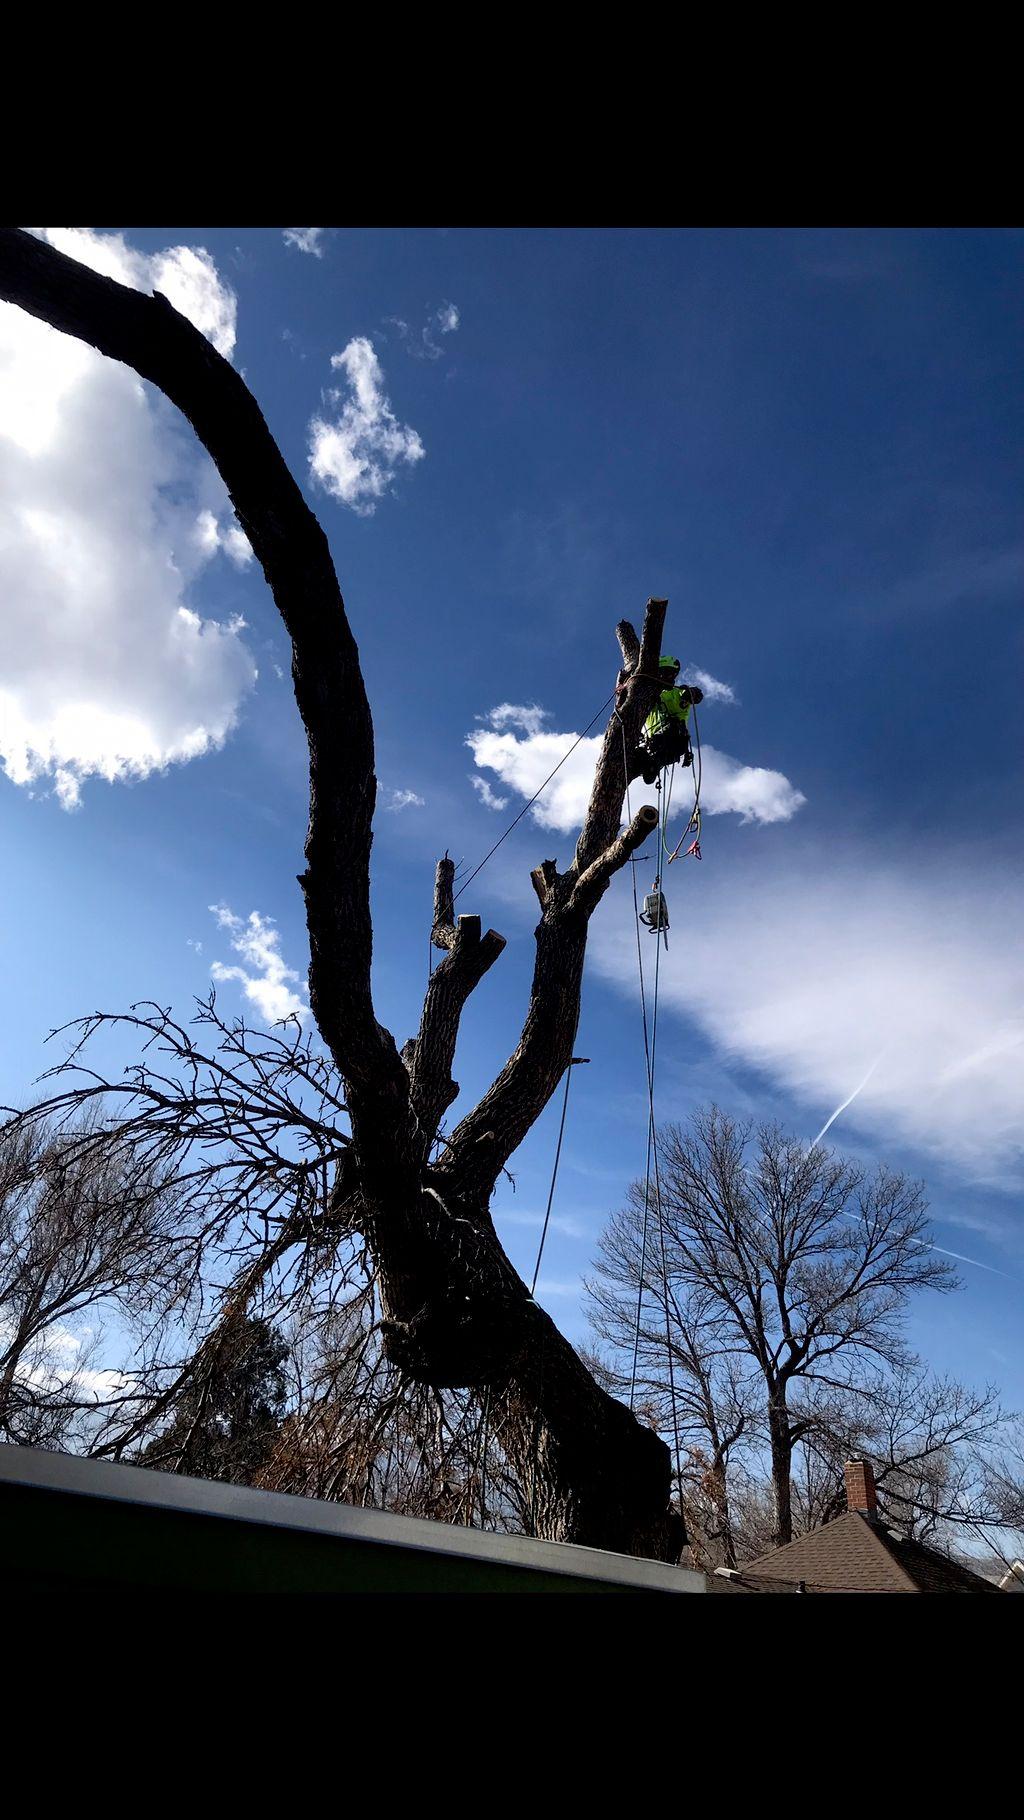 Lumberjack Tree Services